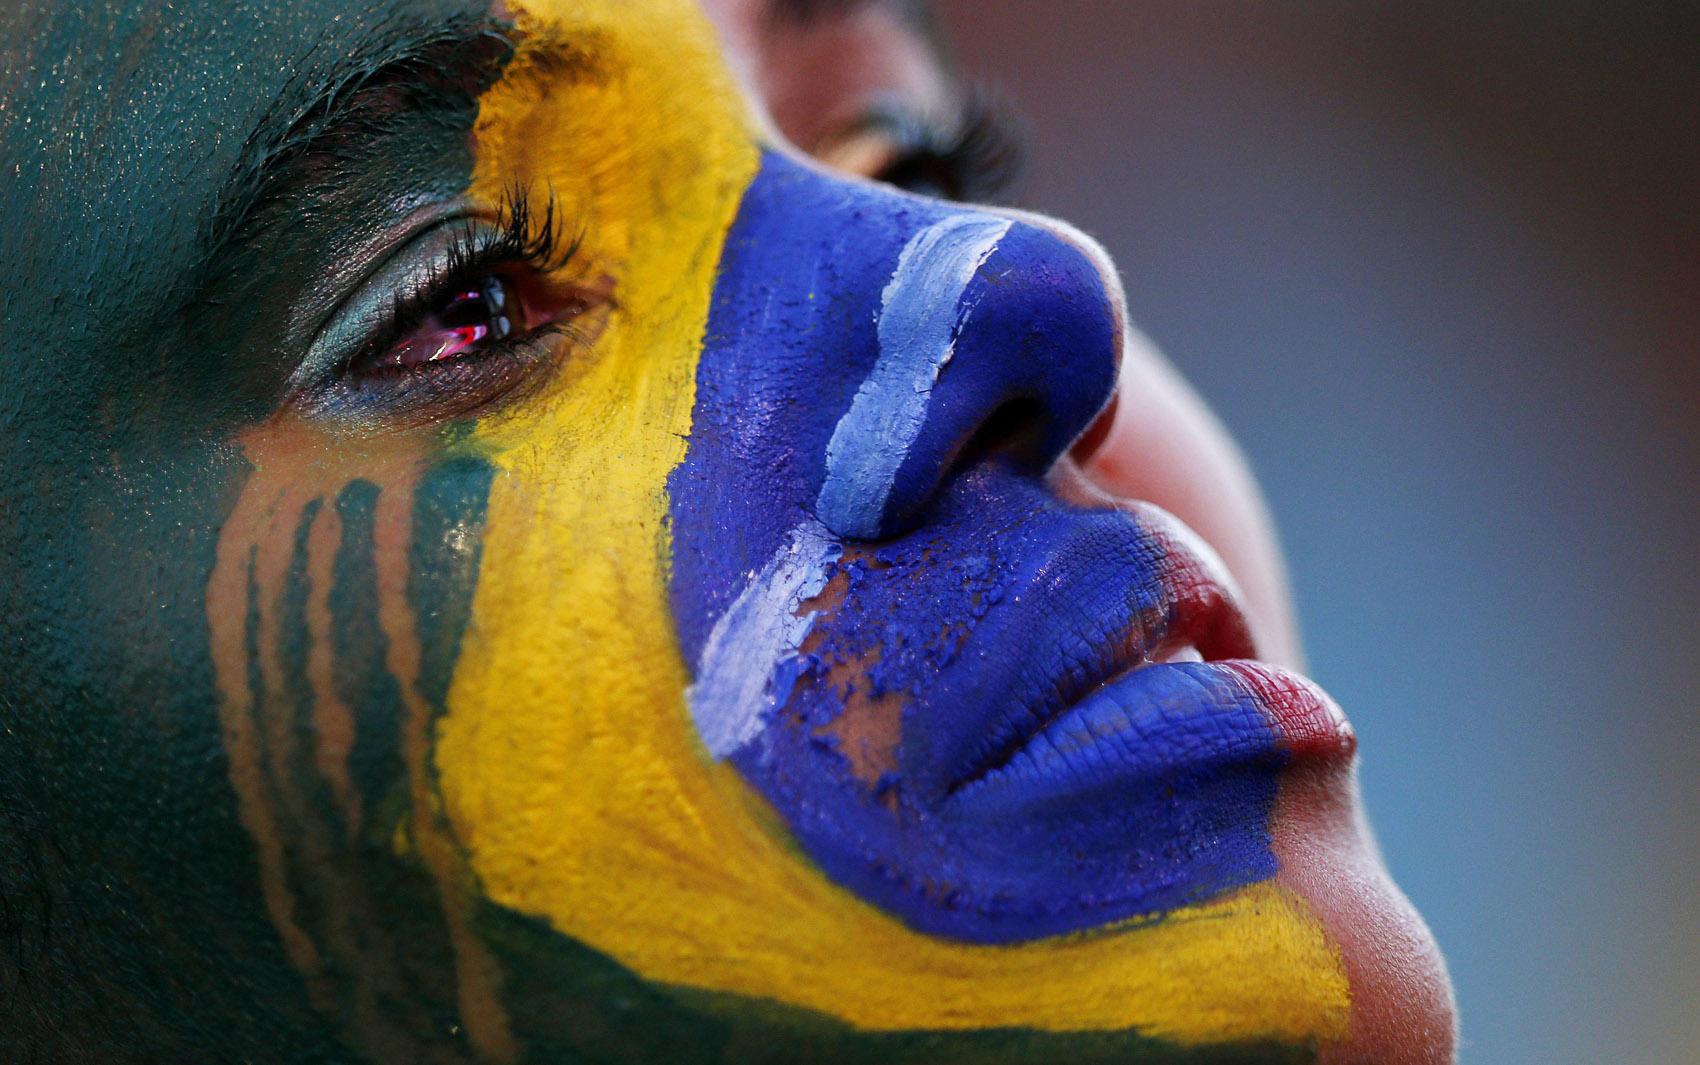 Mulher chora após a derrota do Brasil na semifinal, na Fan Fest em Brasília